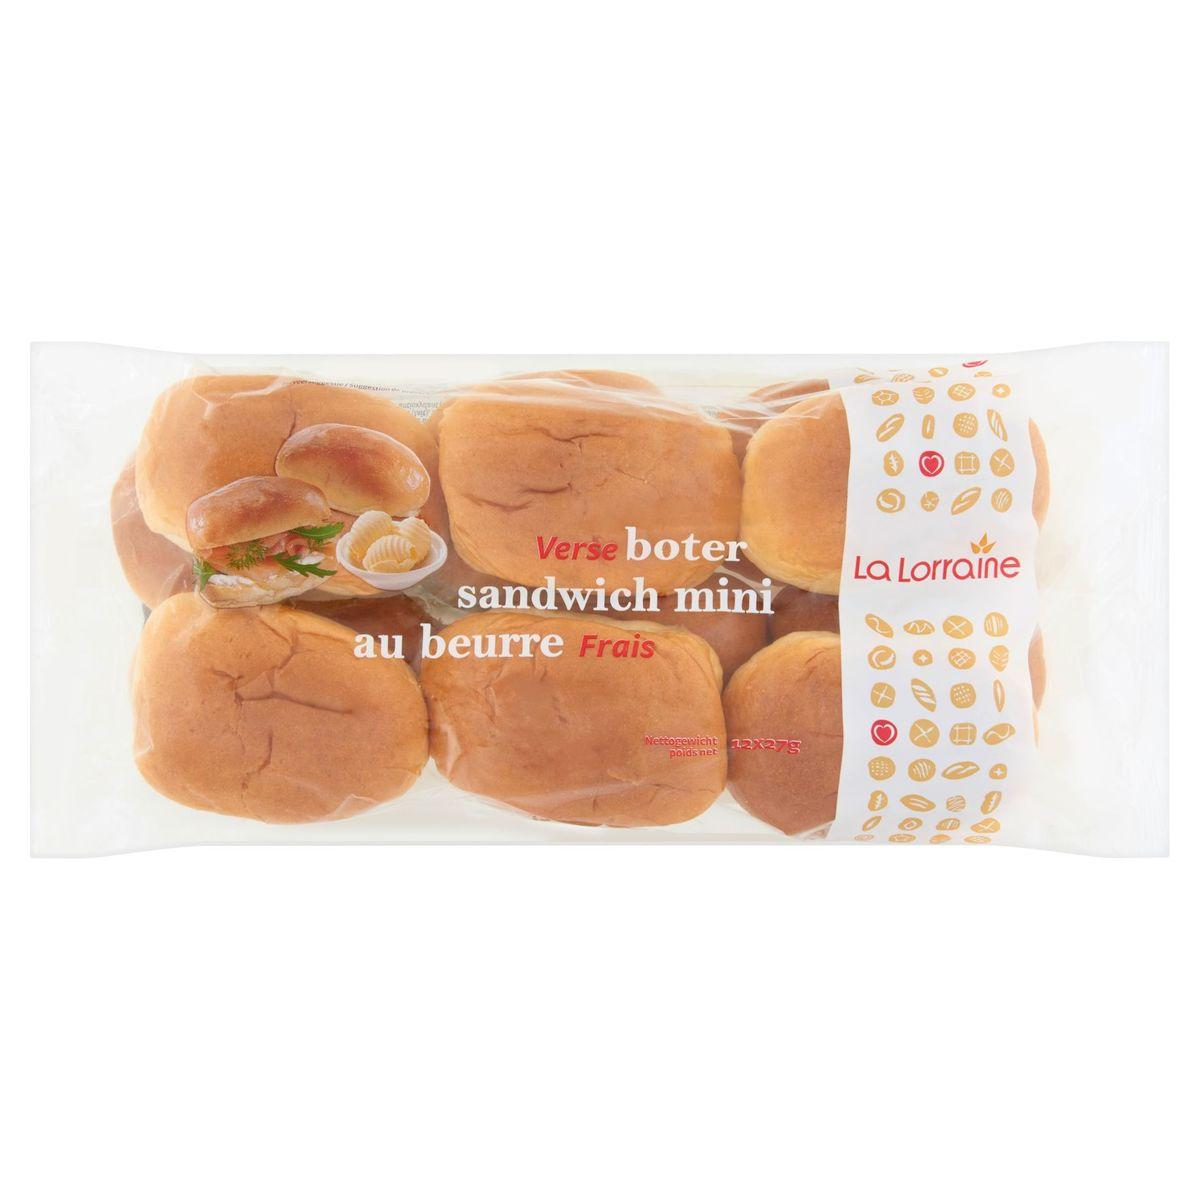 La Lorraine Verse Boter Sandwich Mini 12 x 27 g